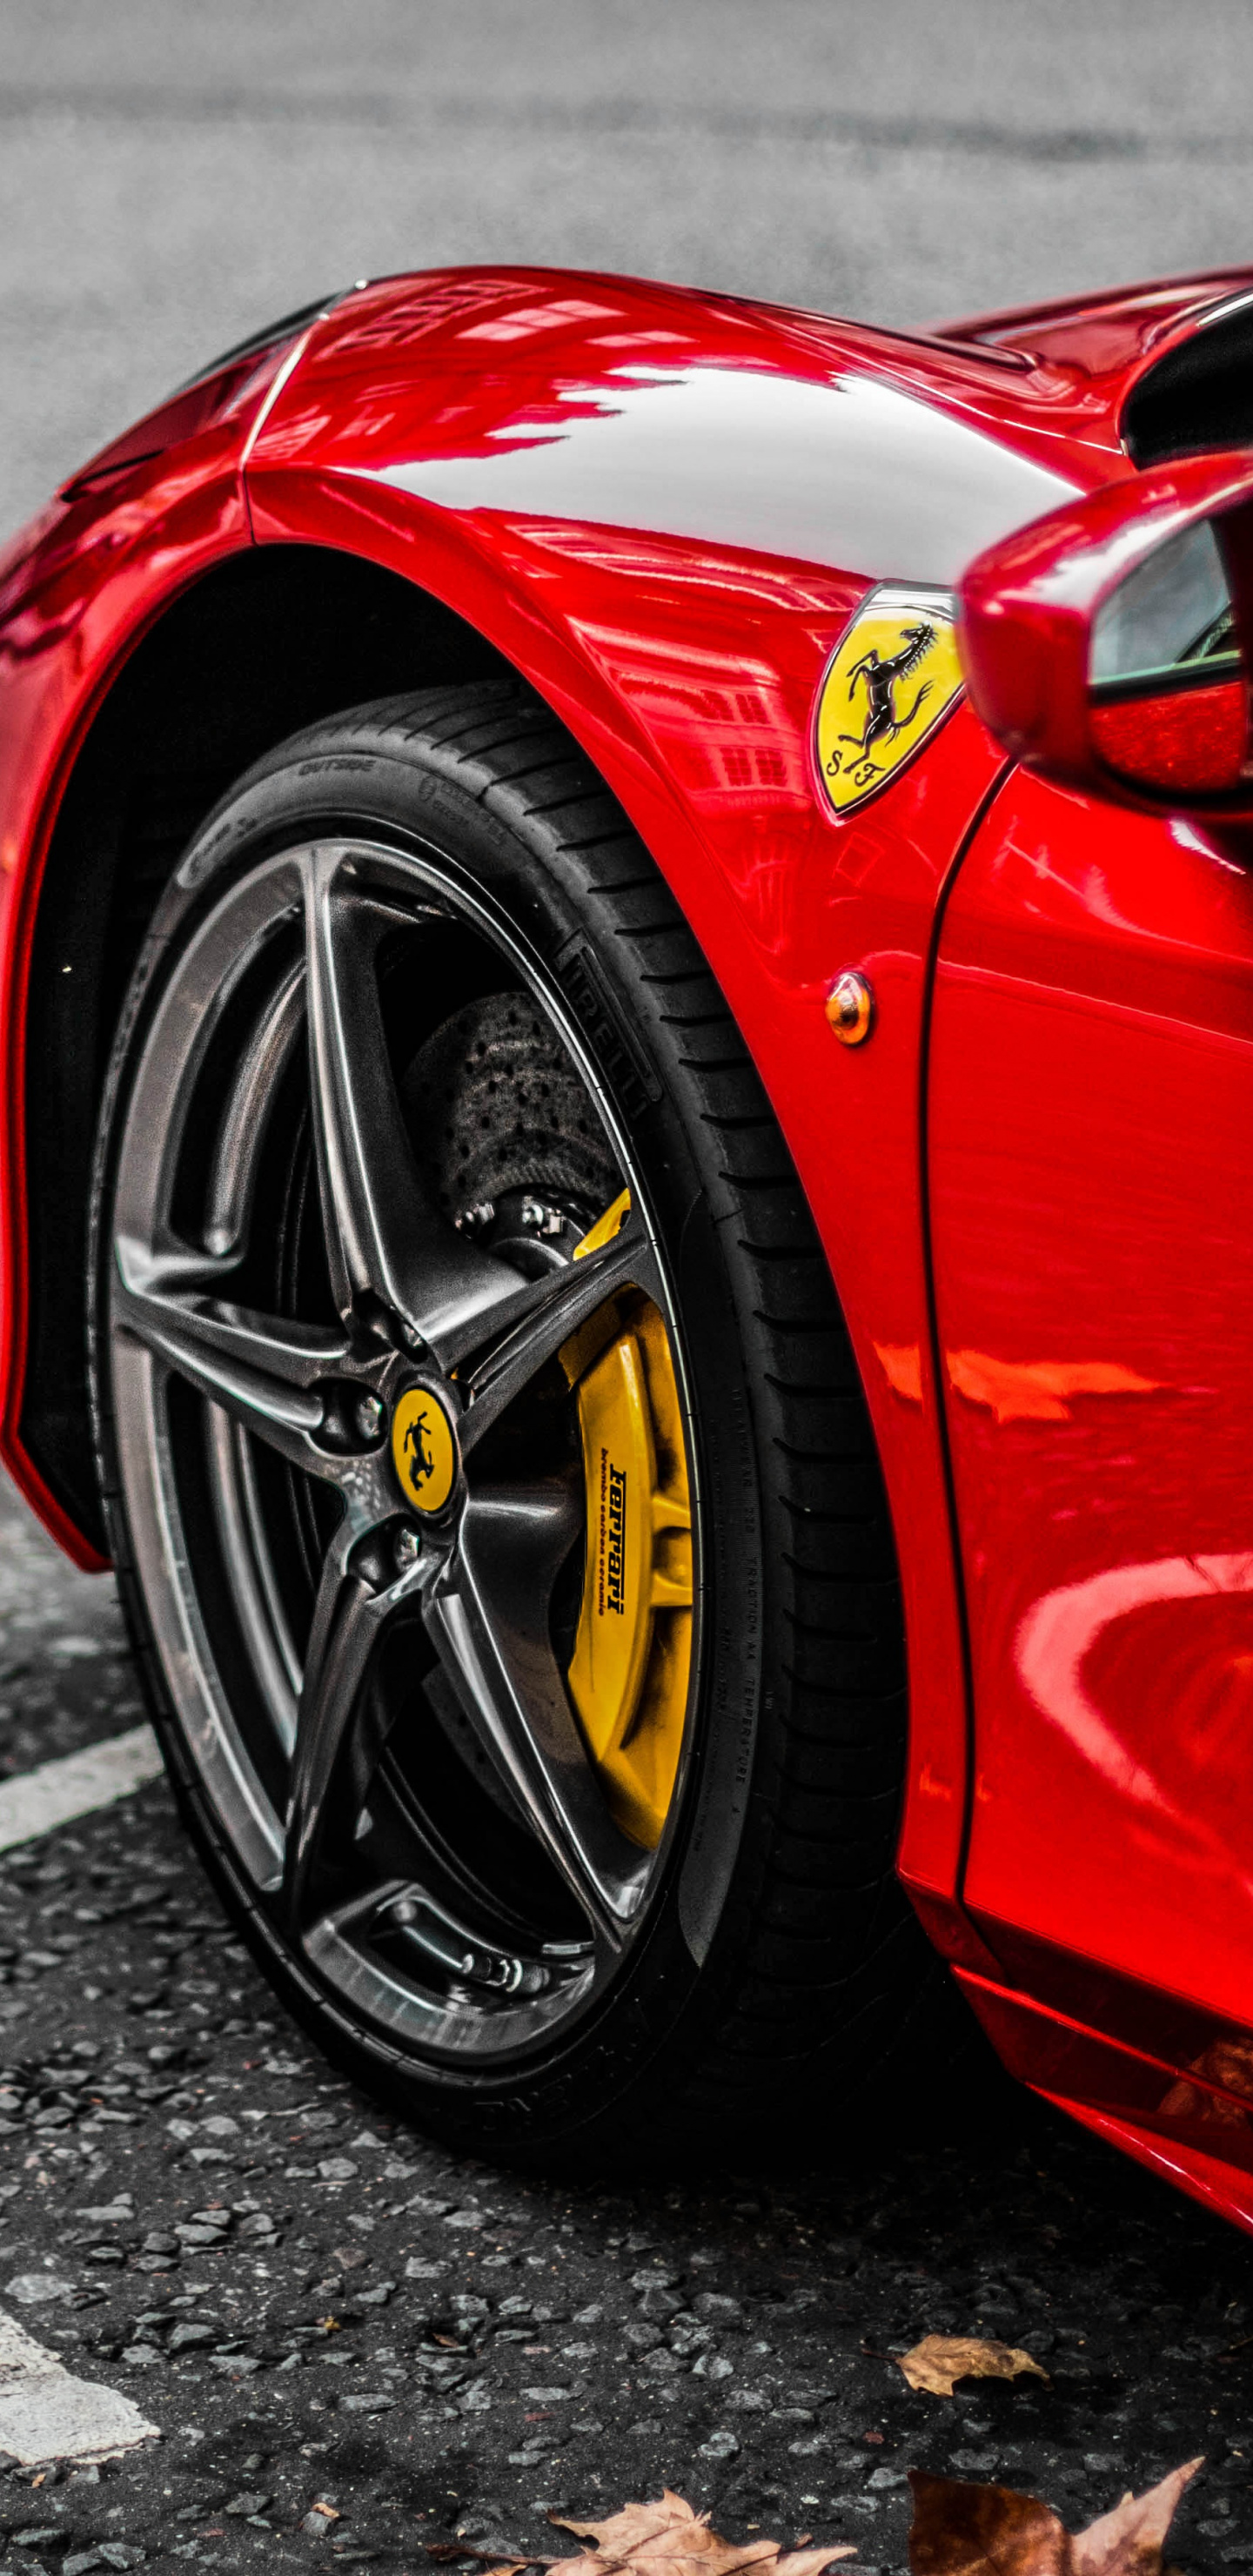 Red Supercar Ferrari Wheel Wallpaper Ultra Hd Ferrari Wallpapers 4k 2099607 Hd Wallpaper Backgrounds Download